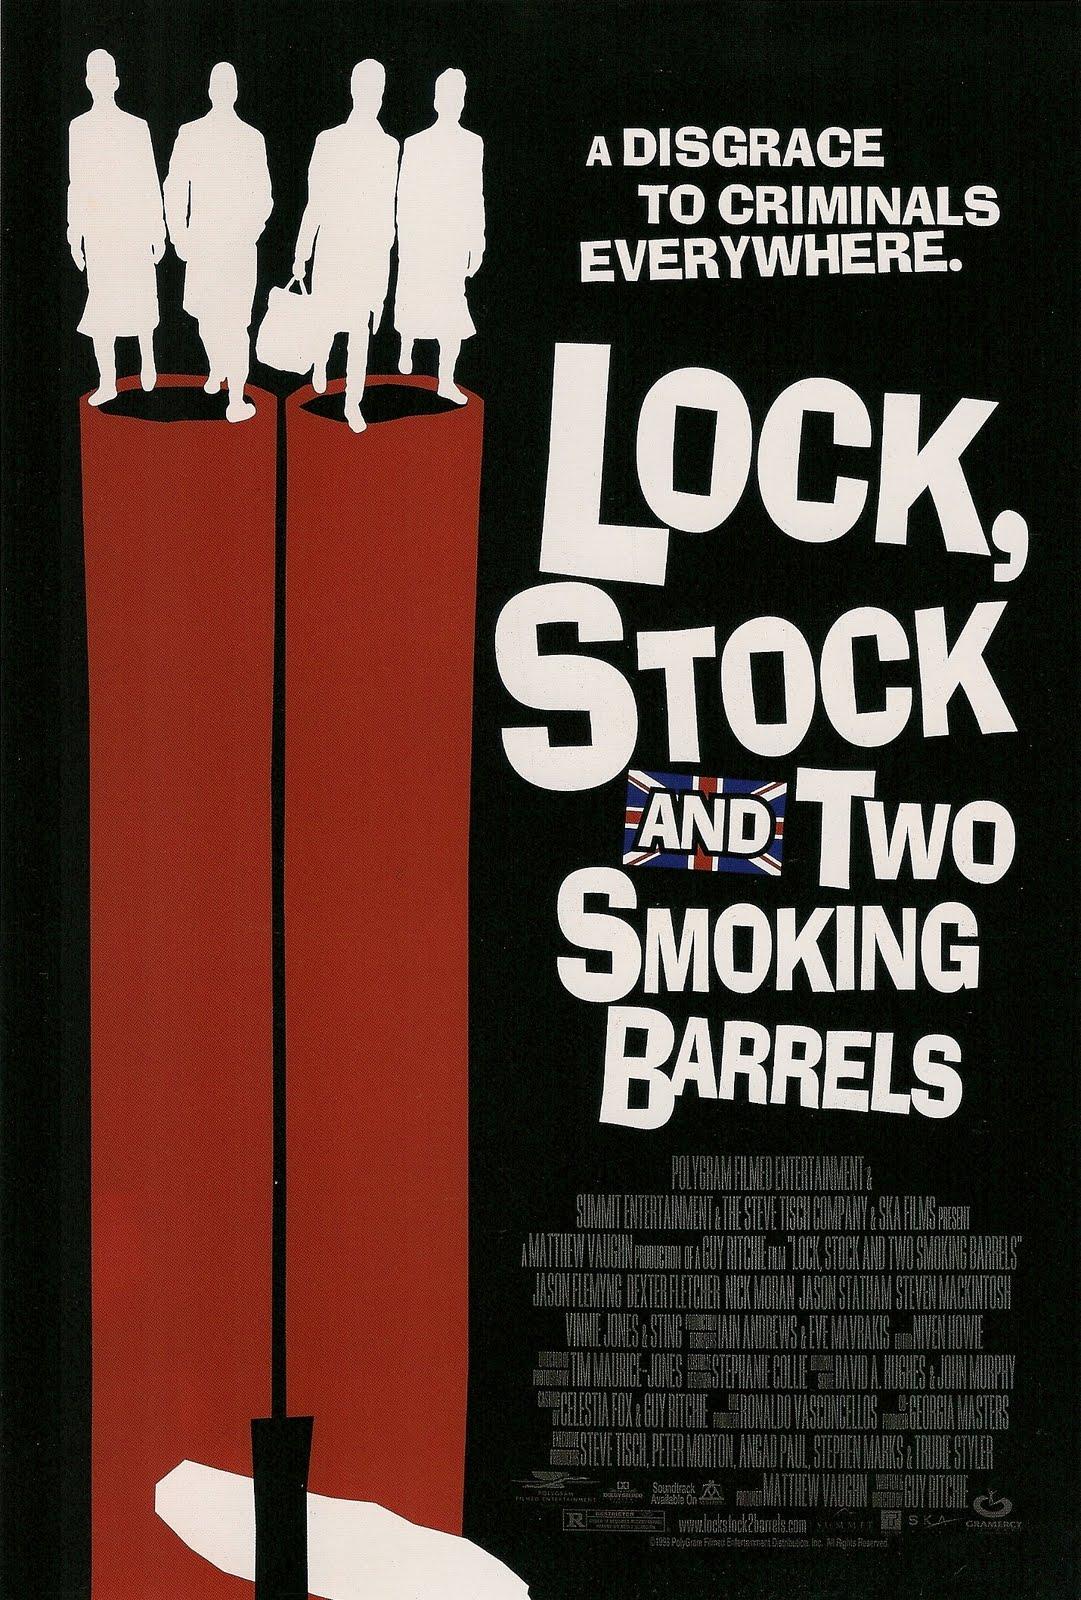 Lock stock and two smoking barrels dildo